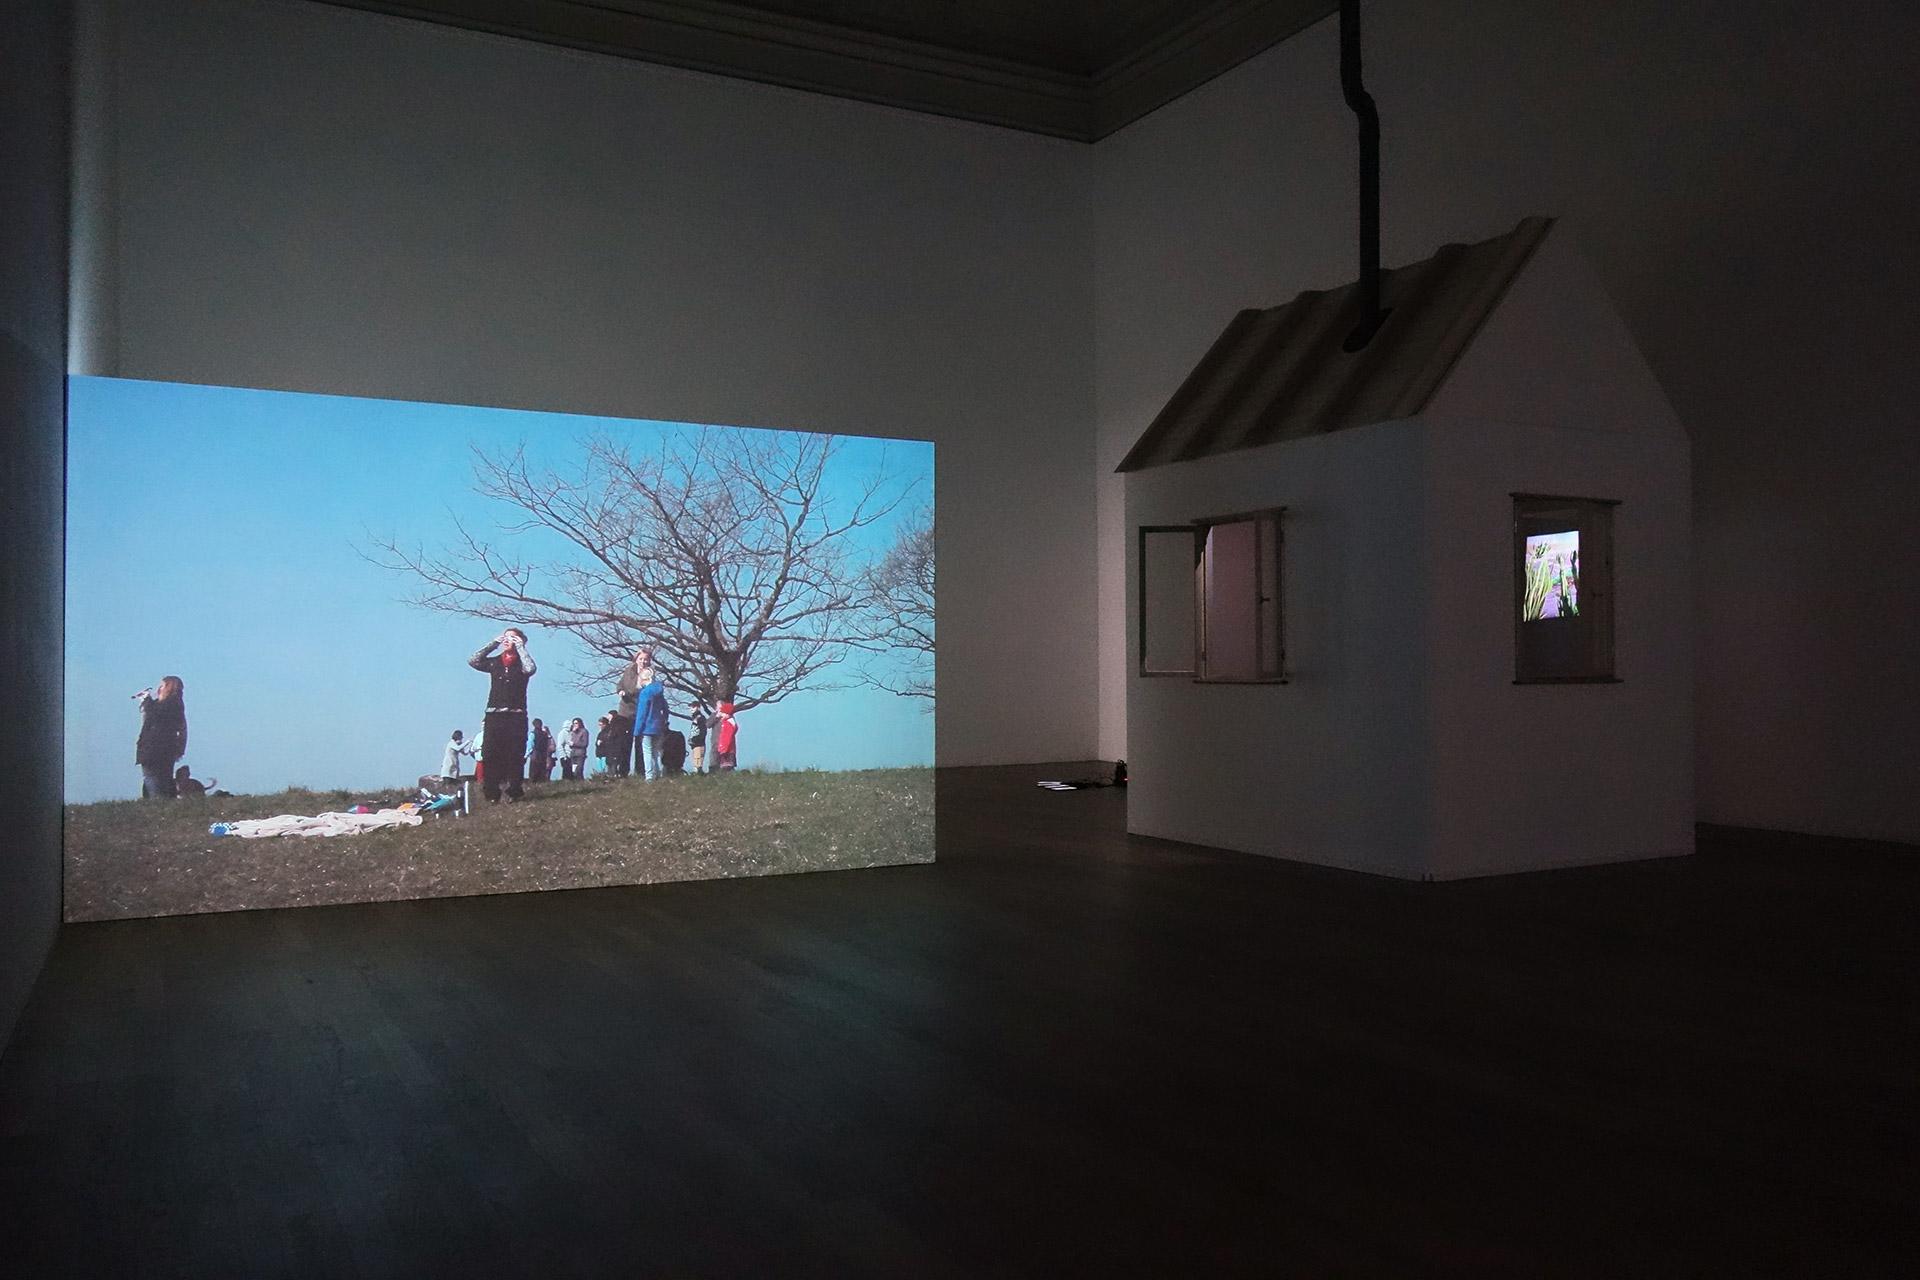 Kunsthalle-Winterthur-Dezember-Ausstellung-2017-1.jpg